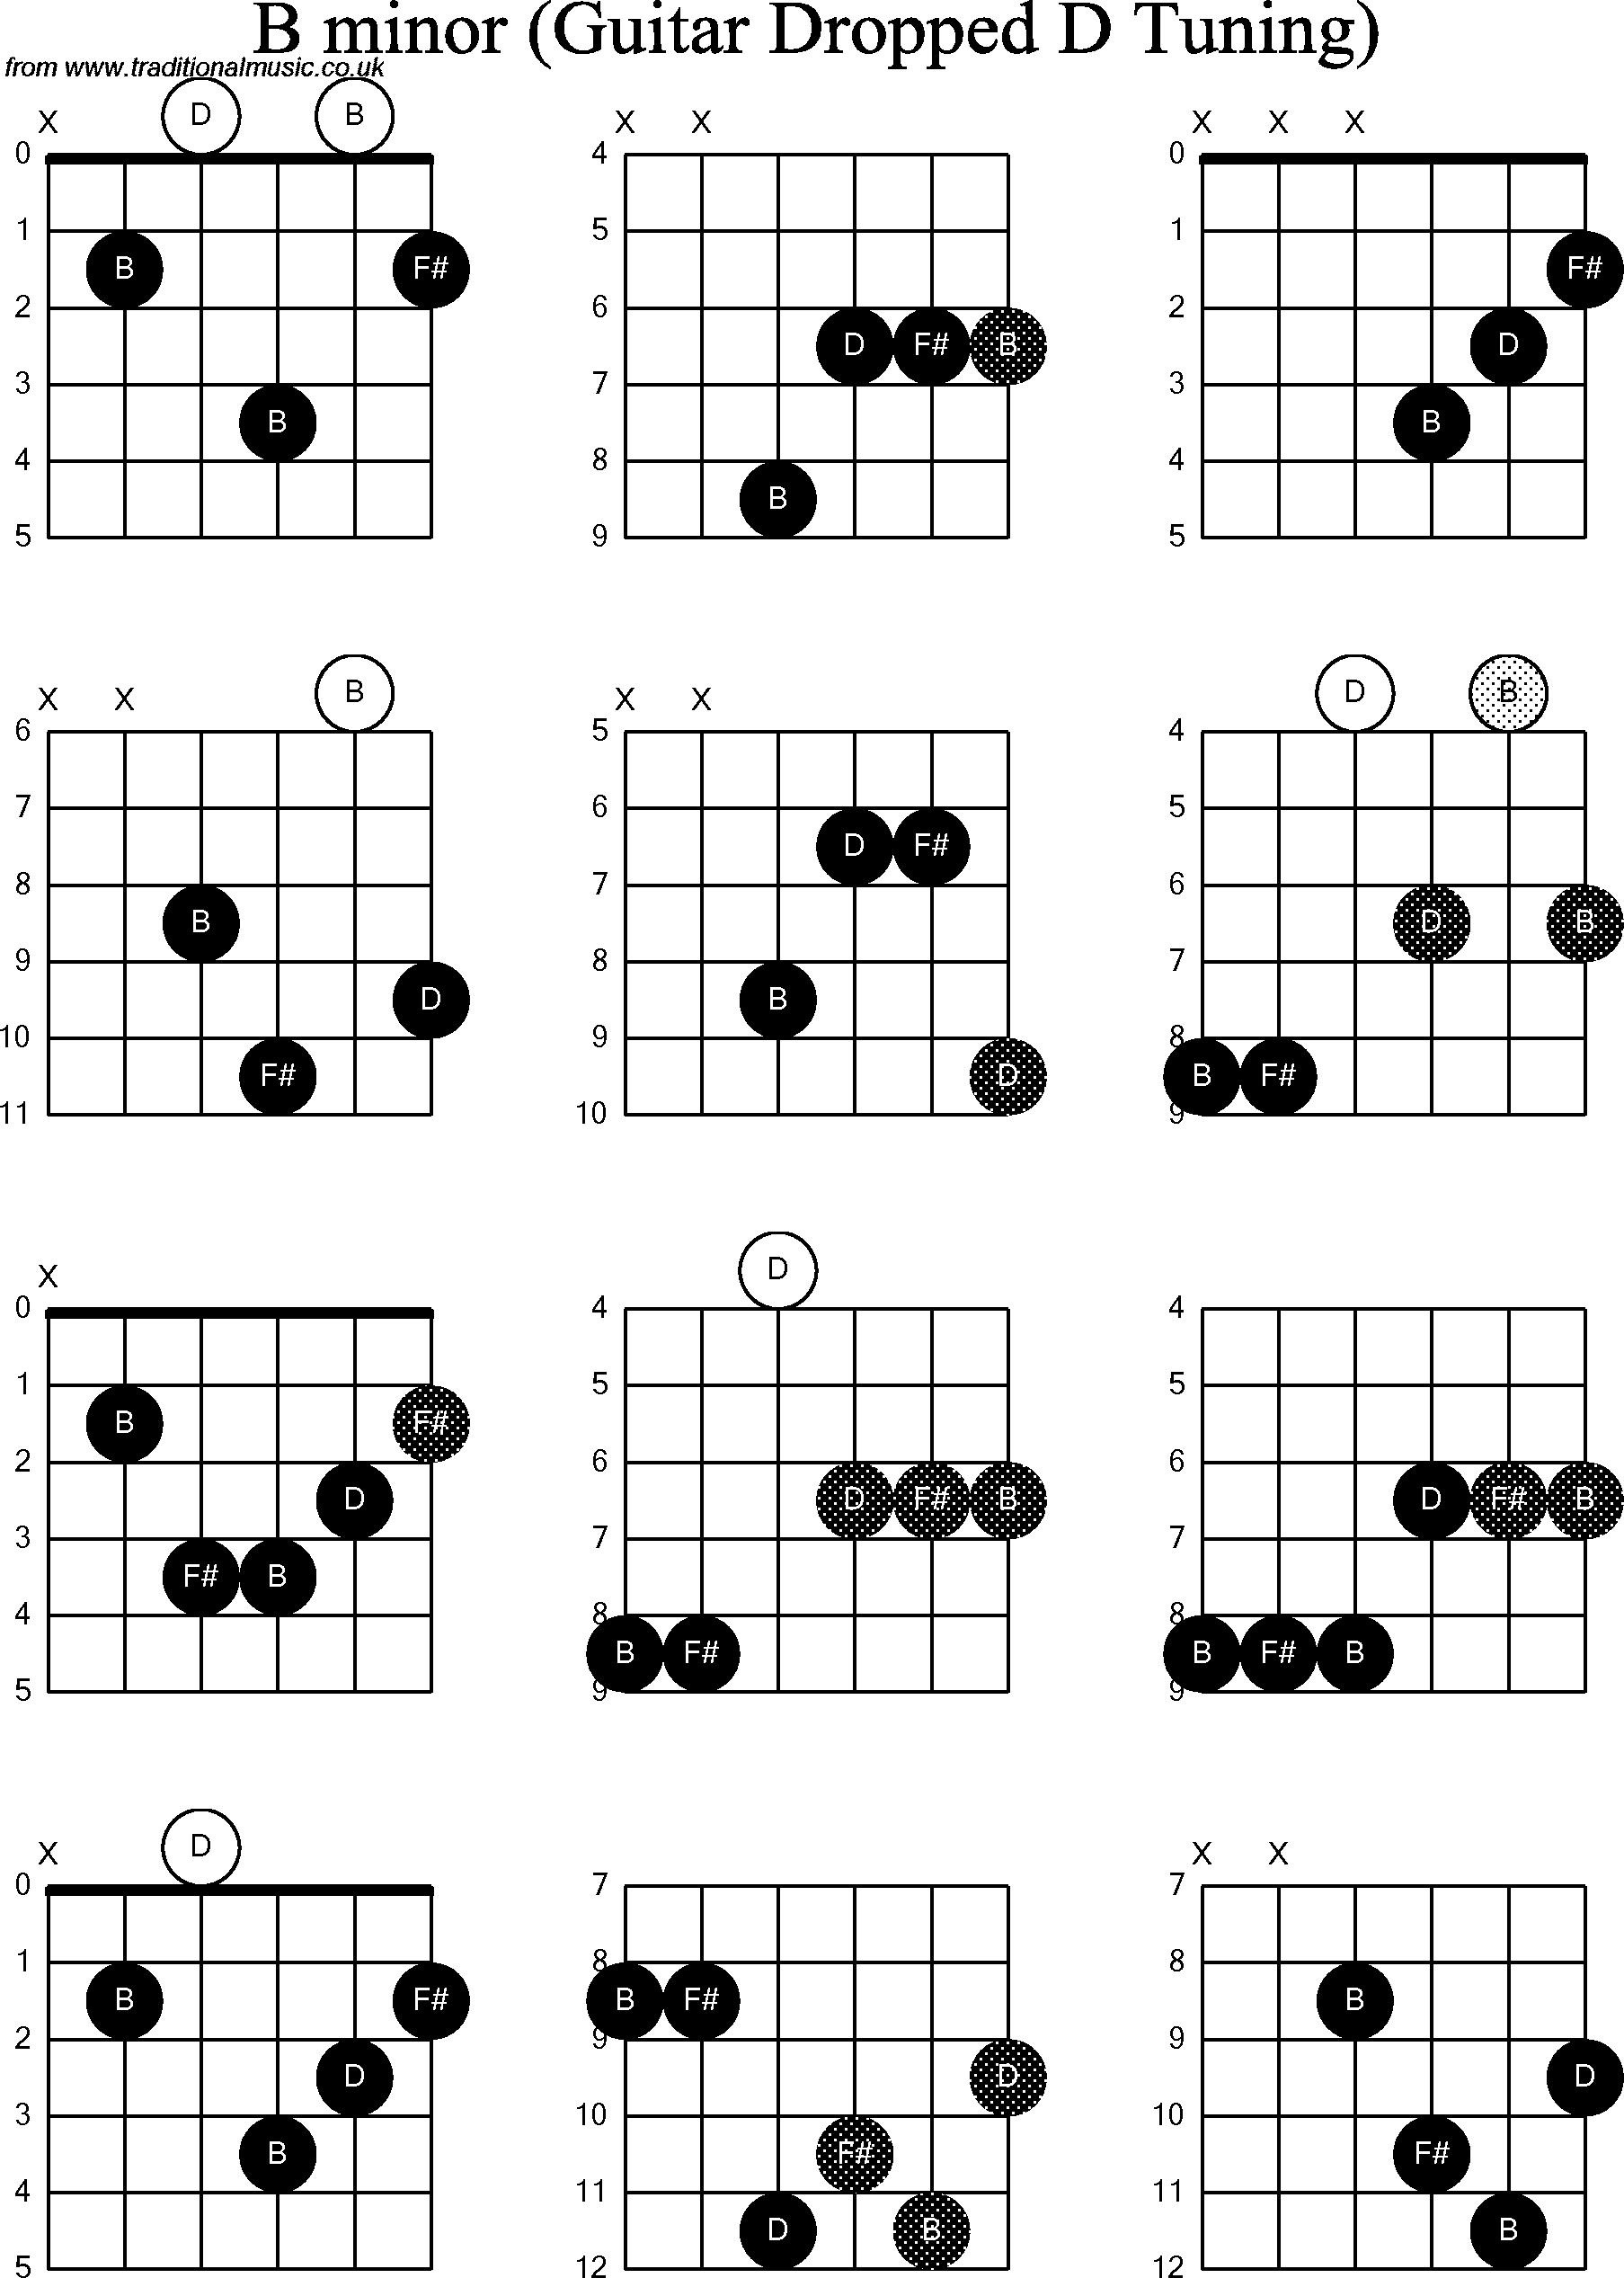 B Minor Guitar Chord Chord Diagrams For Dropped D Guitardadgbe B Minor